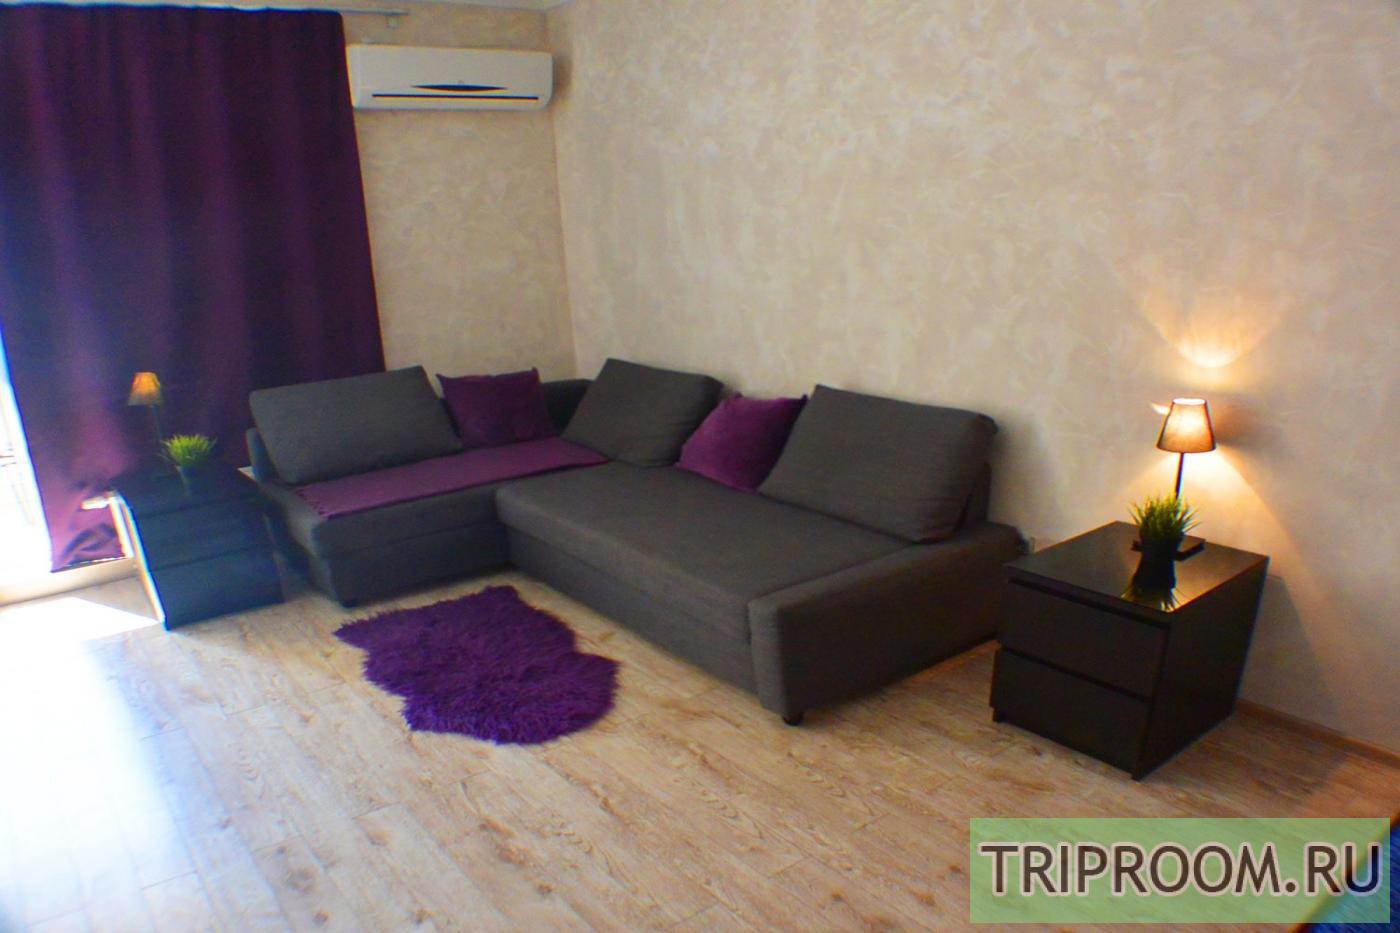 1-комнатная квартира посуточно (вариант № 26990), ул. Кирпичная улица, фото № 3